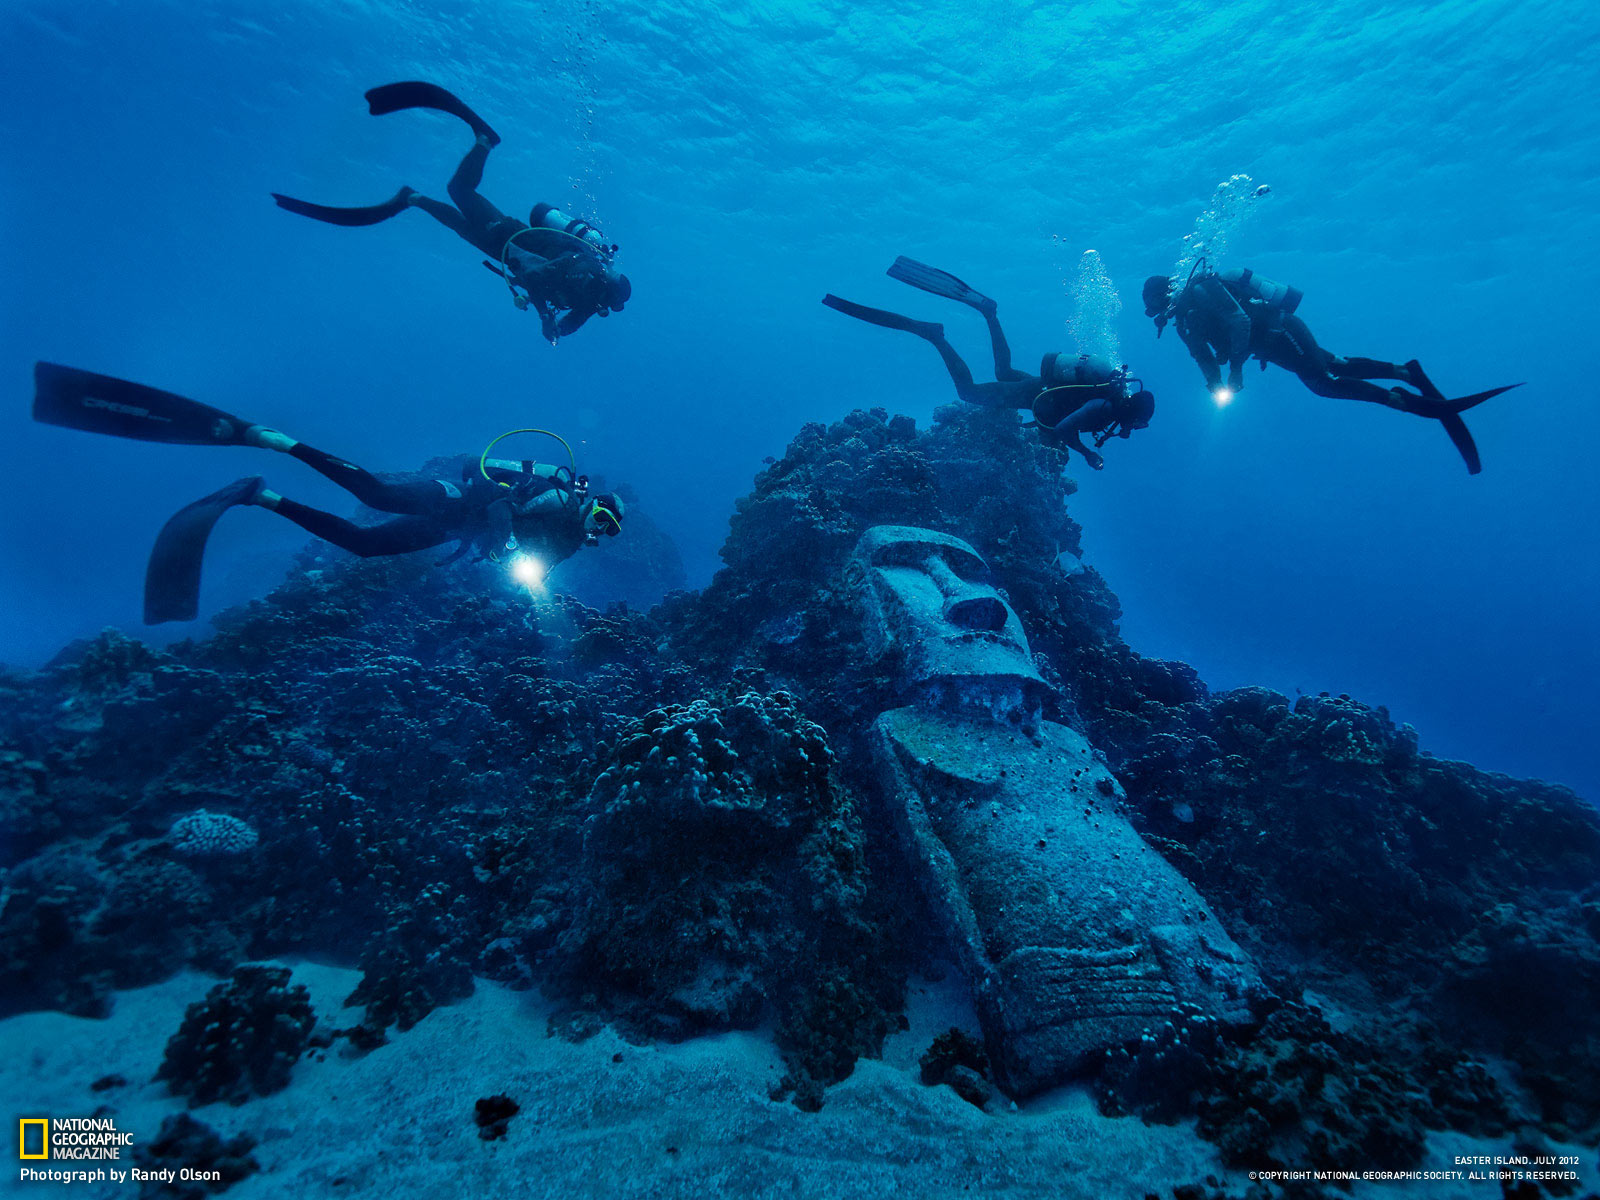 05-tourist-divers-encounter-fake-moai_1600